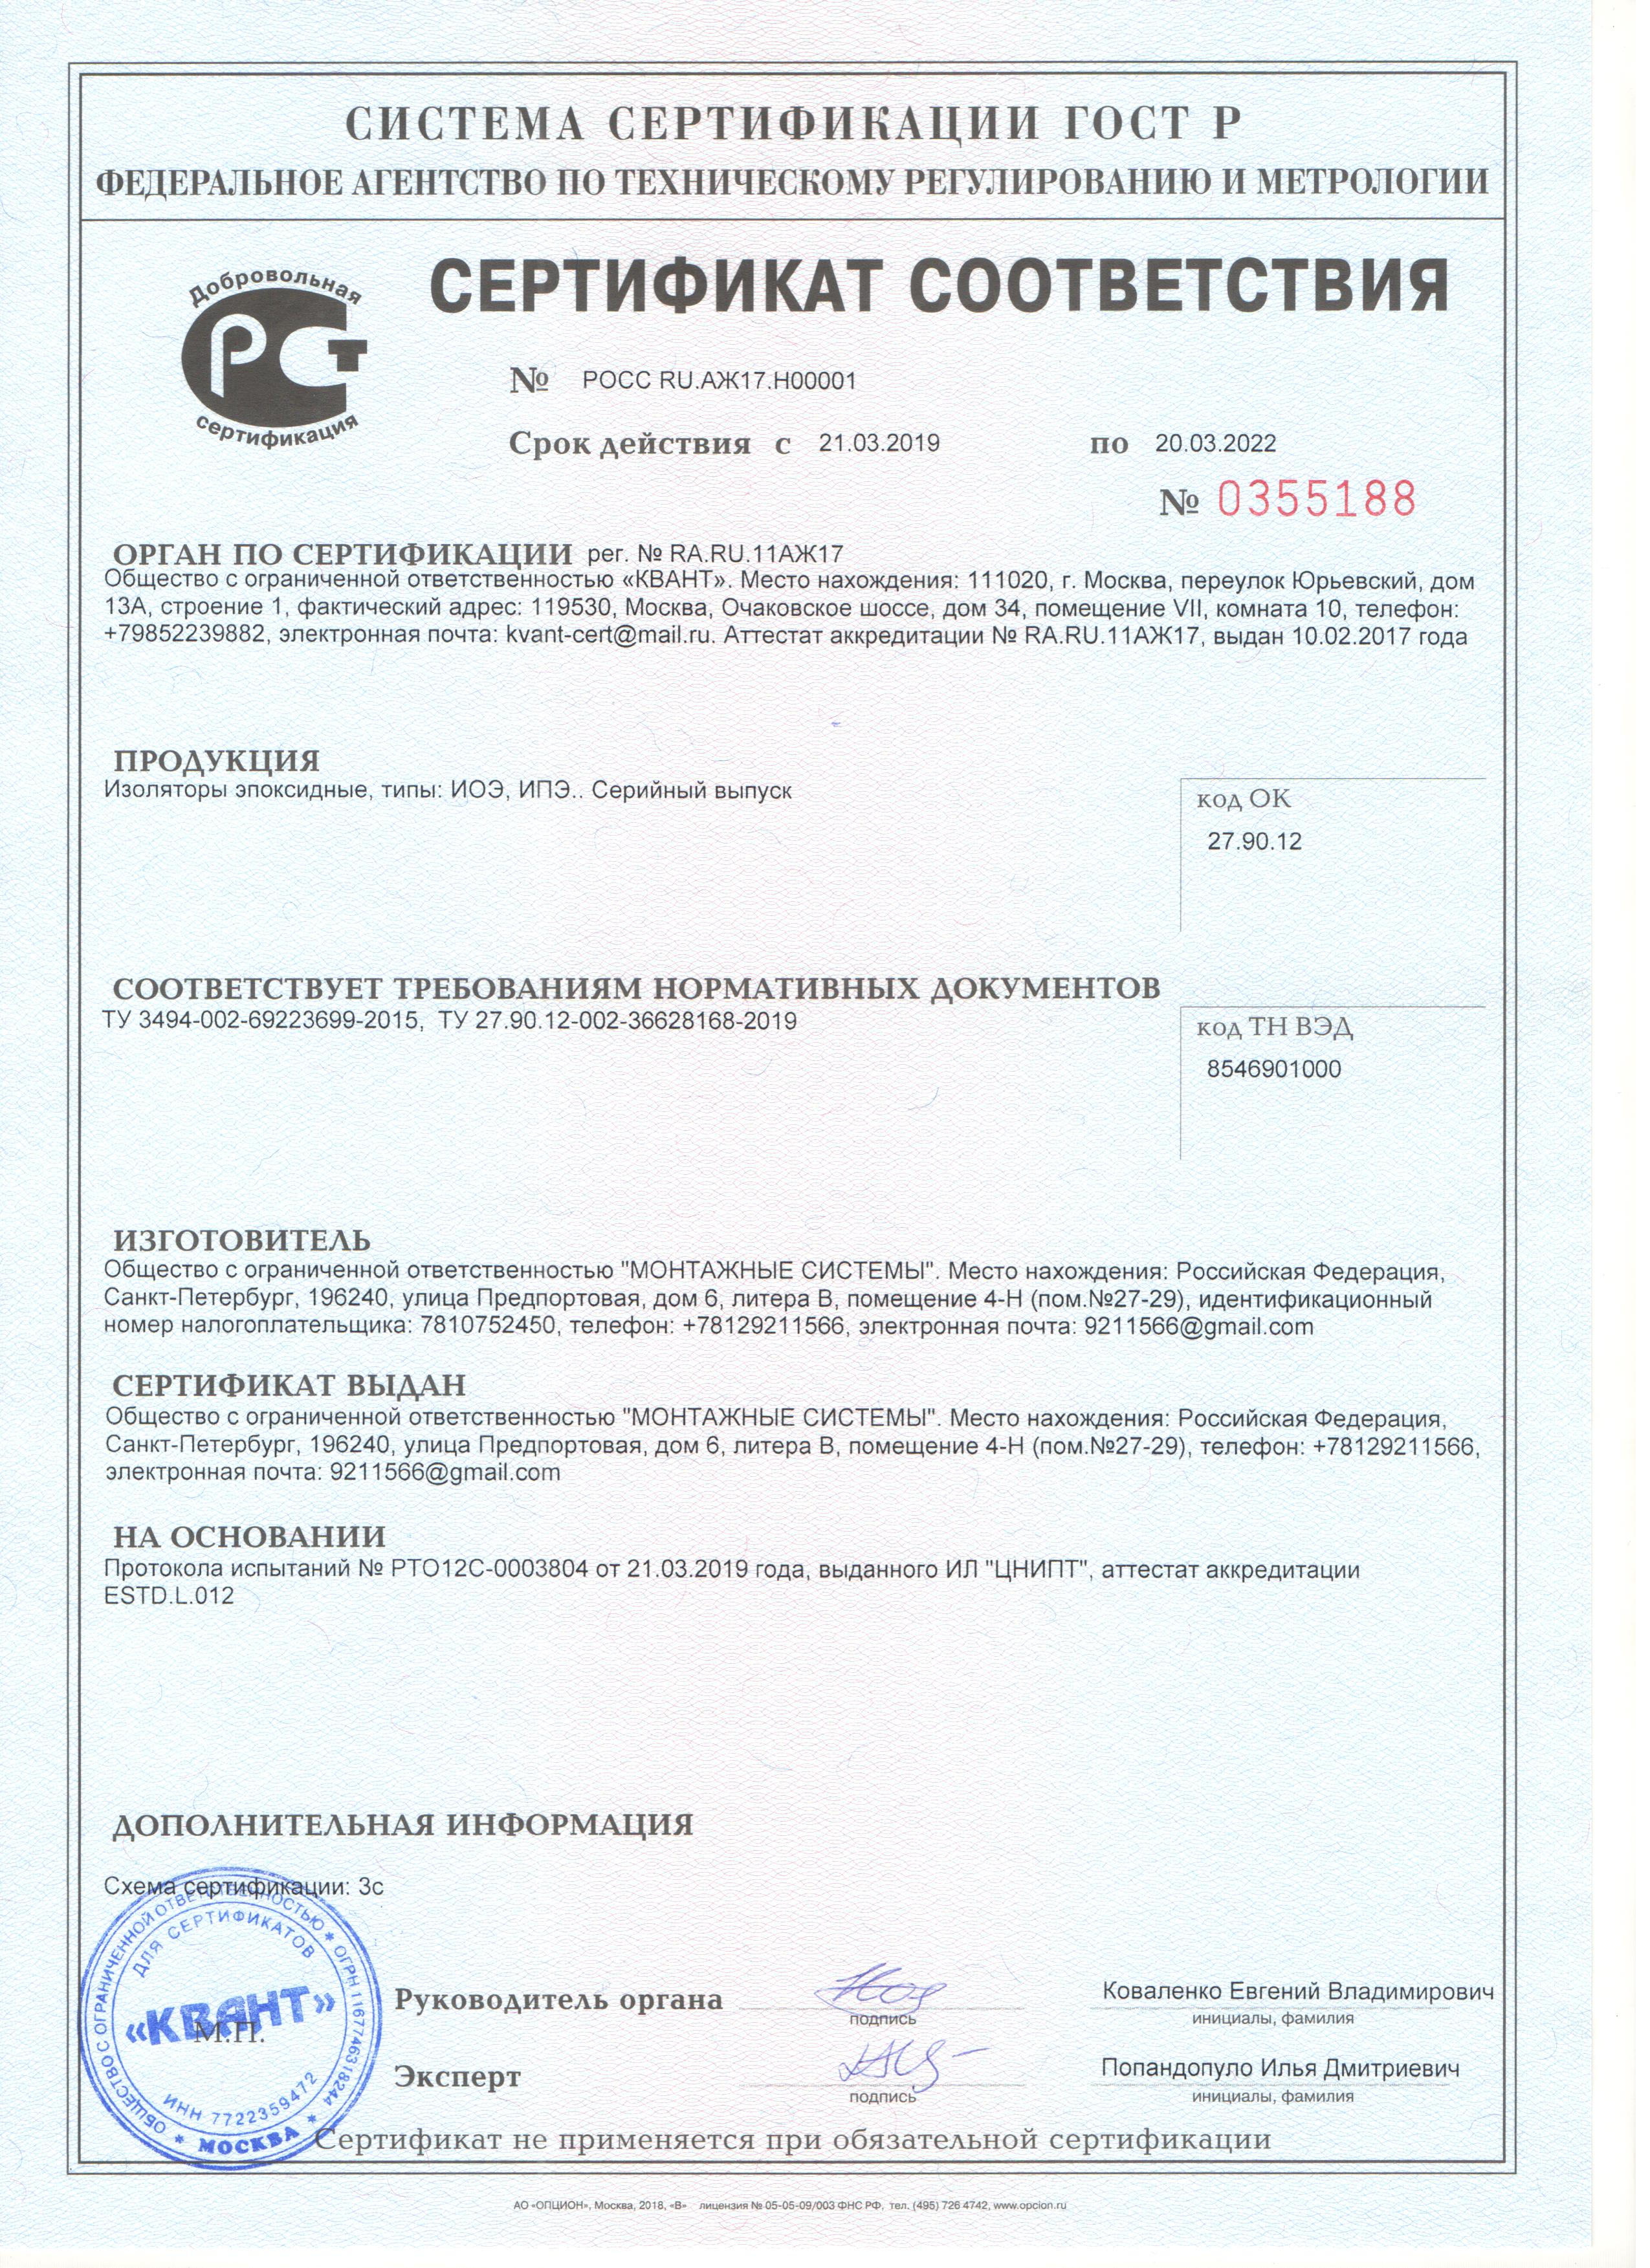 http://montagesystems.ru/files/Сертификат%20на%20Изоляторы%20до%2020.03.2022.jpeg